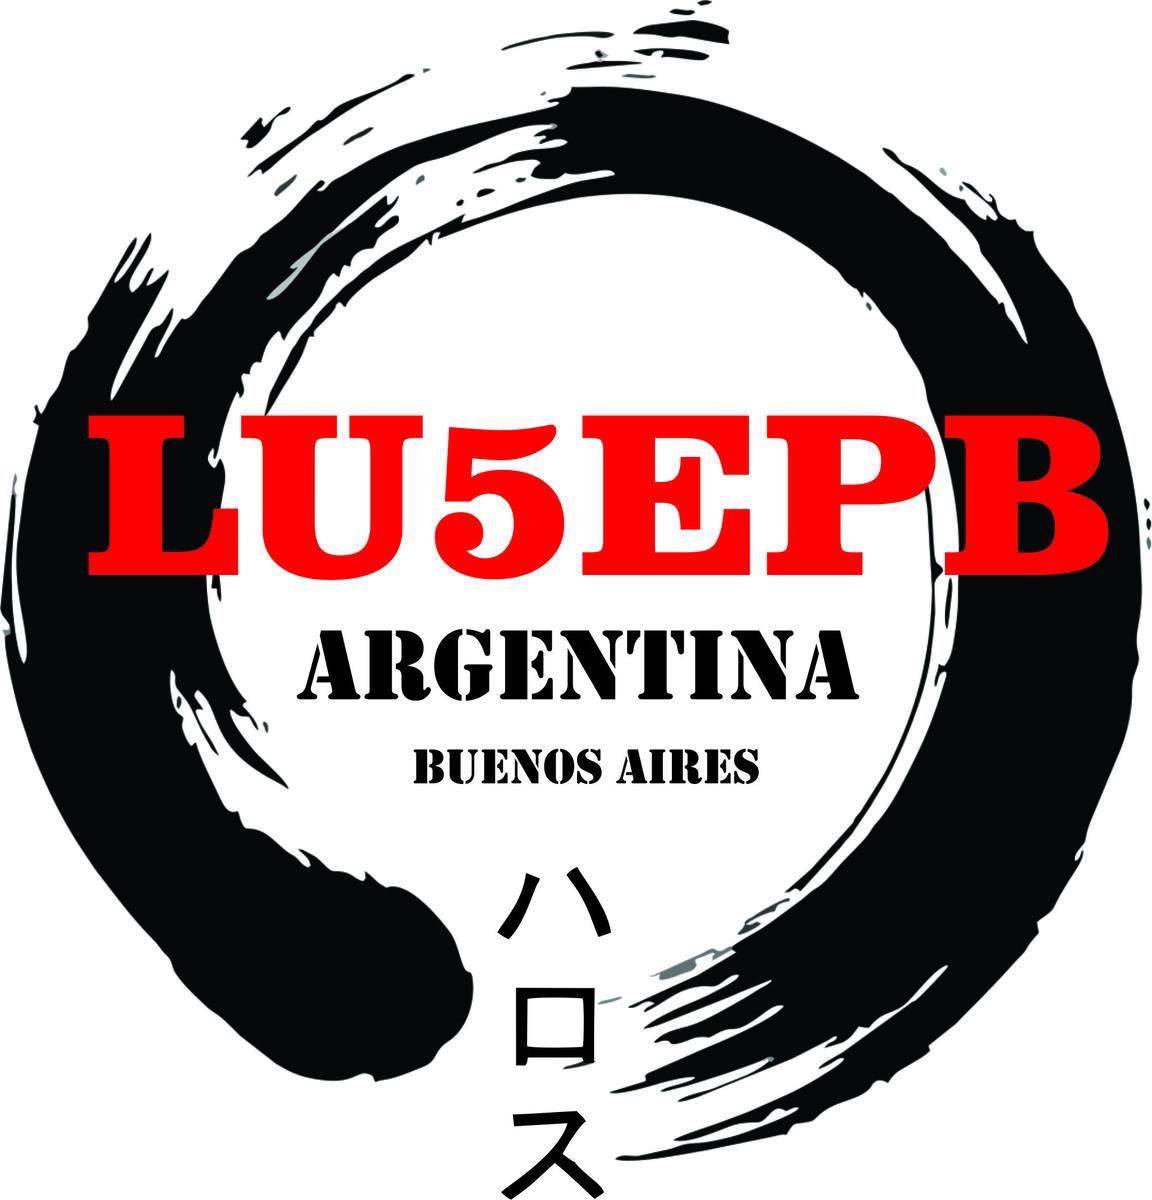 Primary Image for LU5EPB